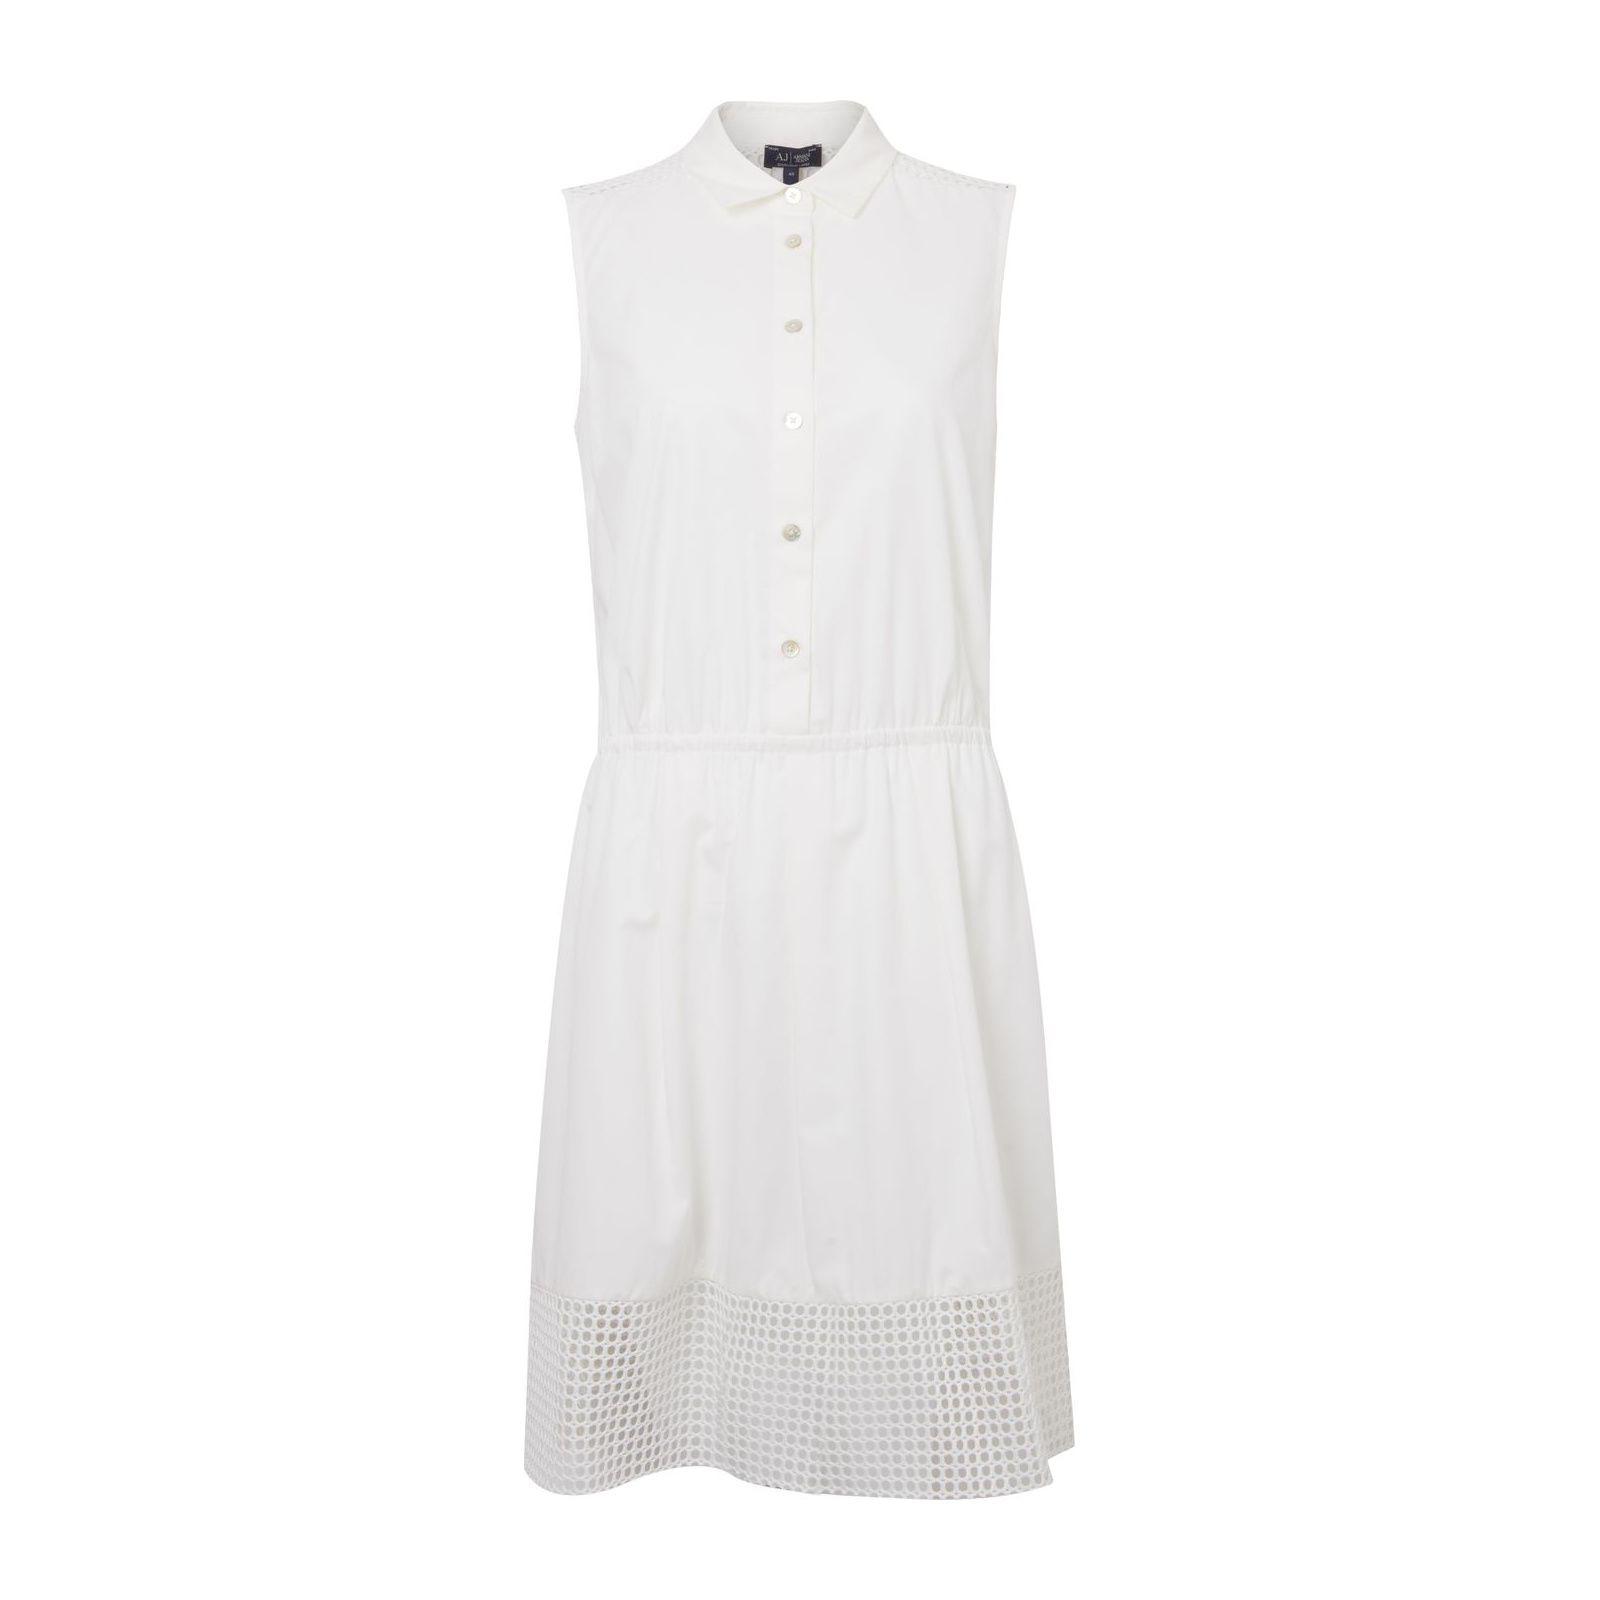 Vestido Recorte Tela - Branco